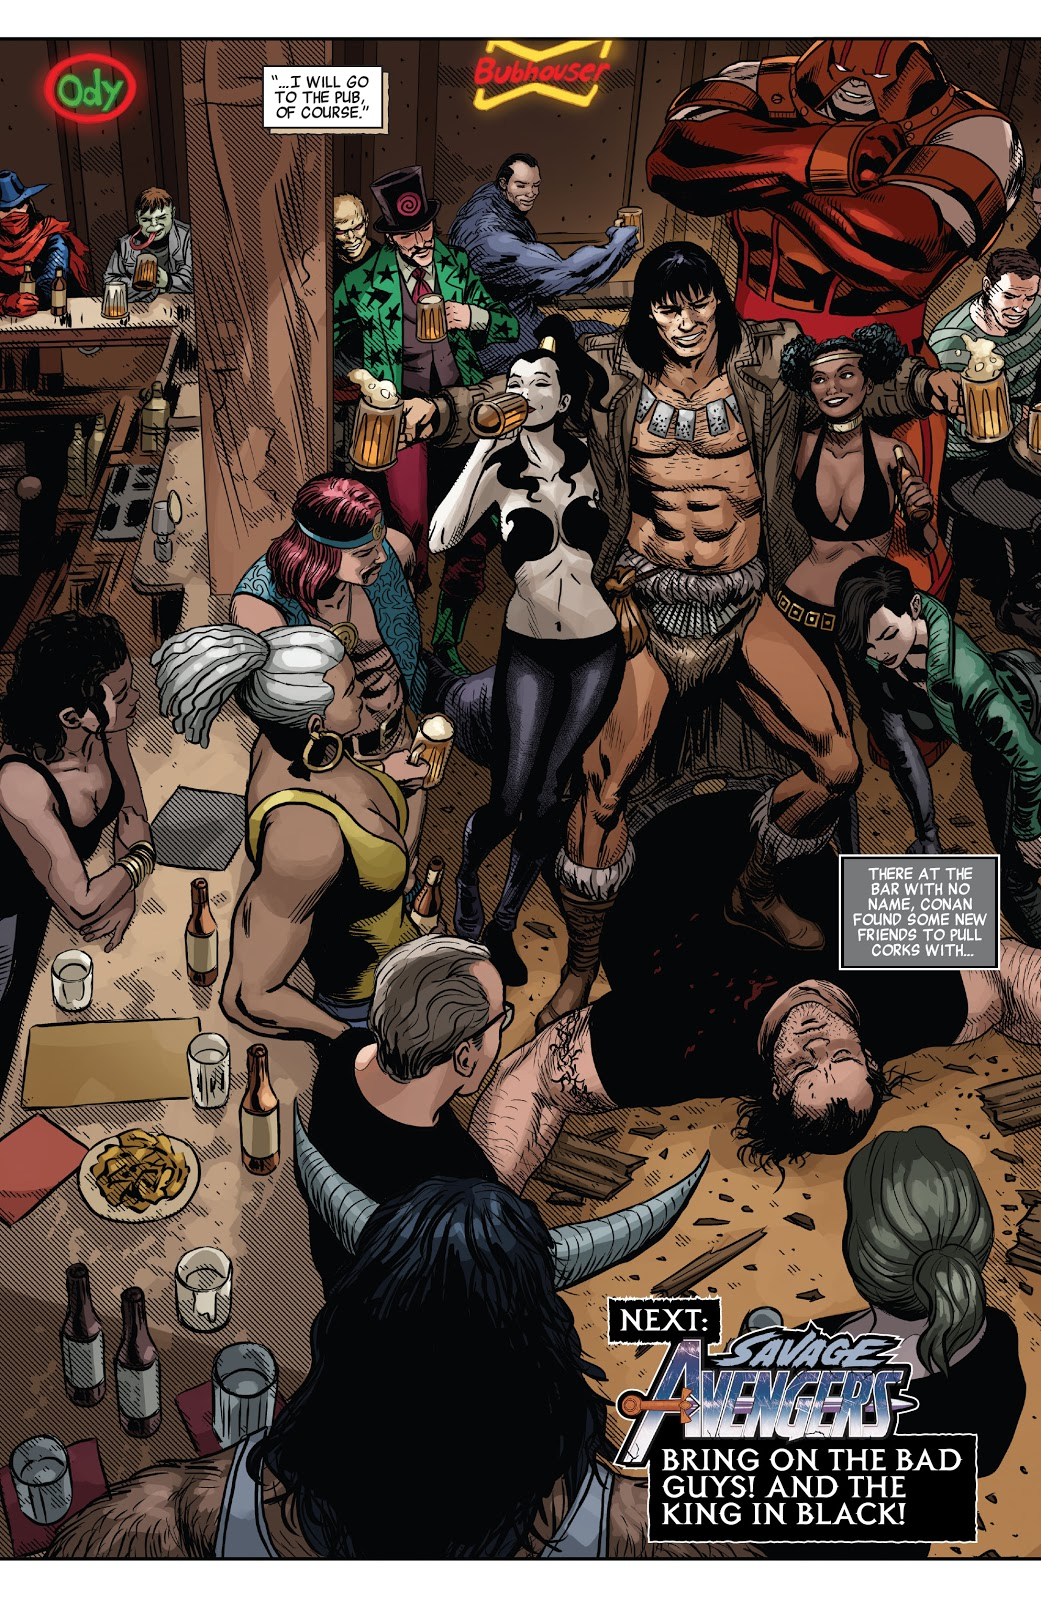 Conan The Barbarian (Savage Avengers #16)